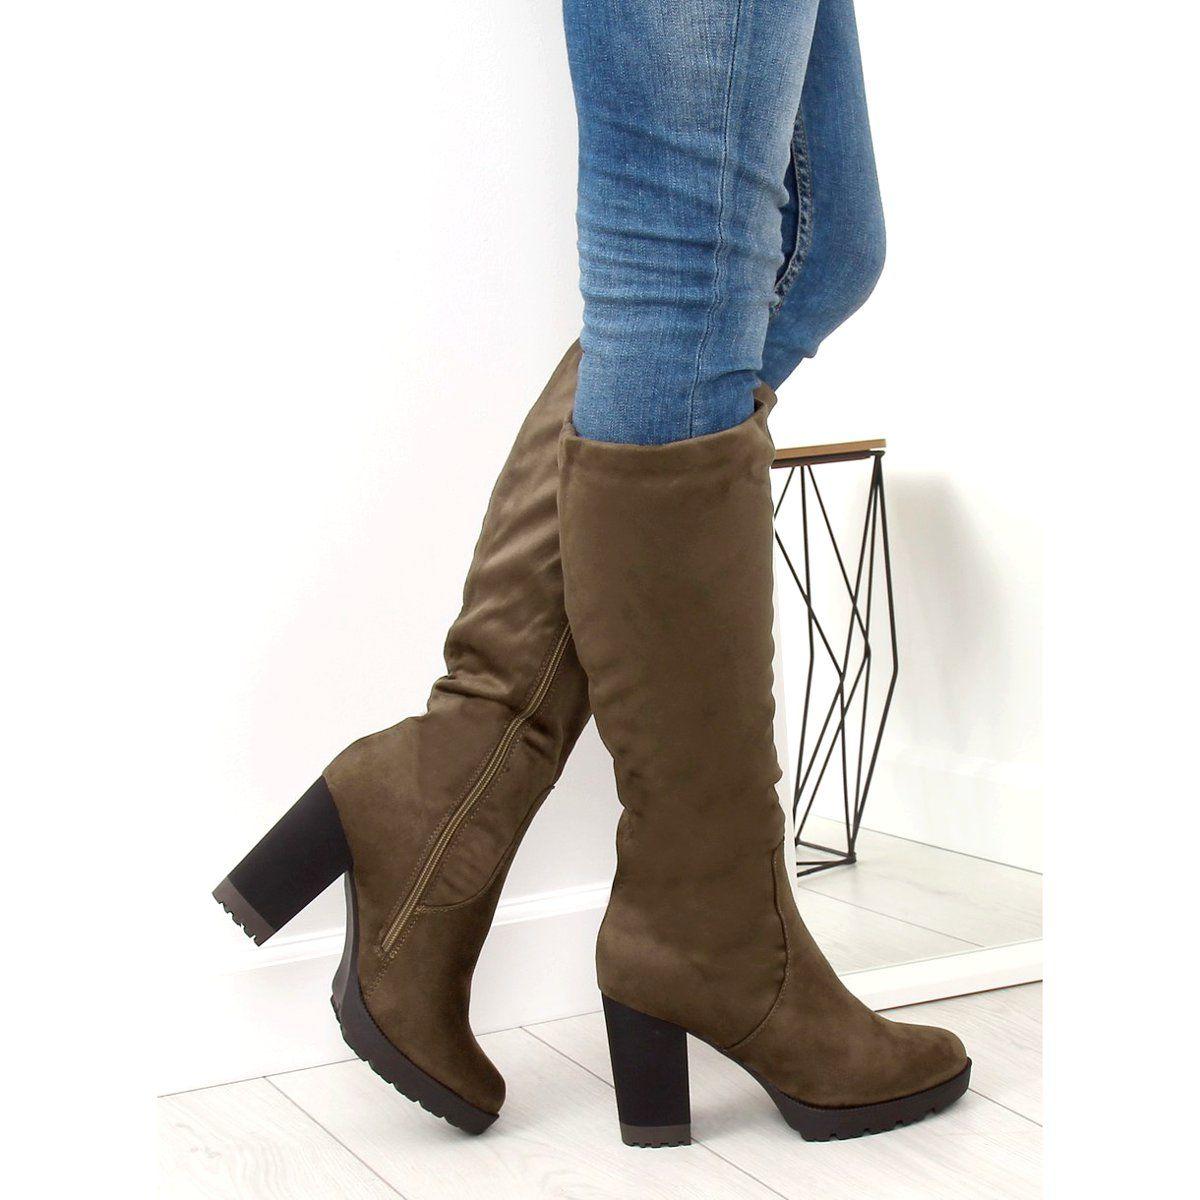 Kozaki Na Obcasie Khaki 7290 Khaki High Heels High Heel Boots Boot Shoes Women